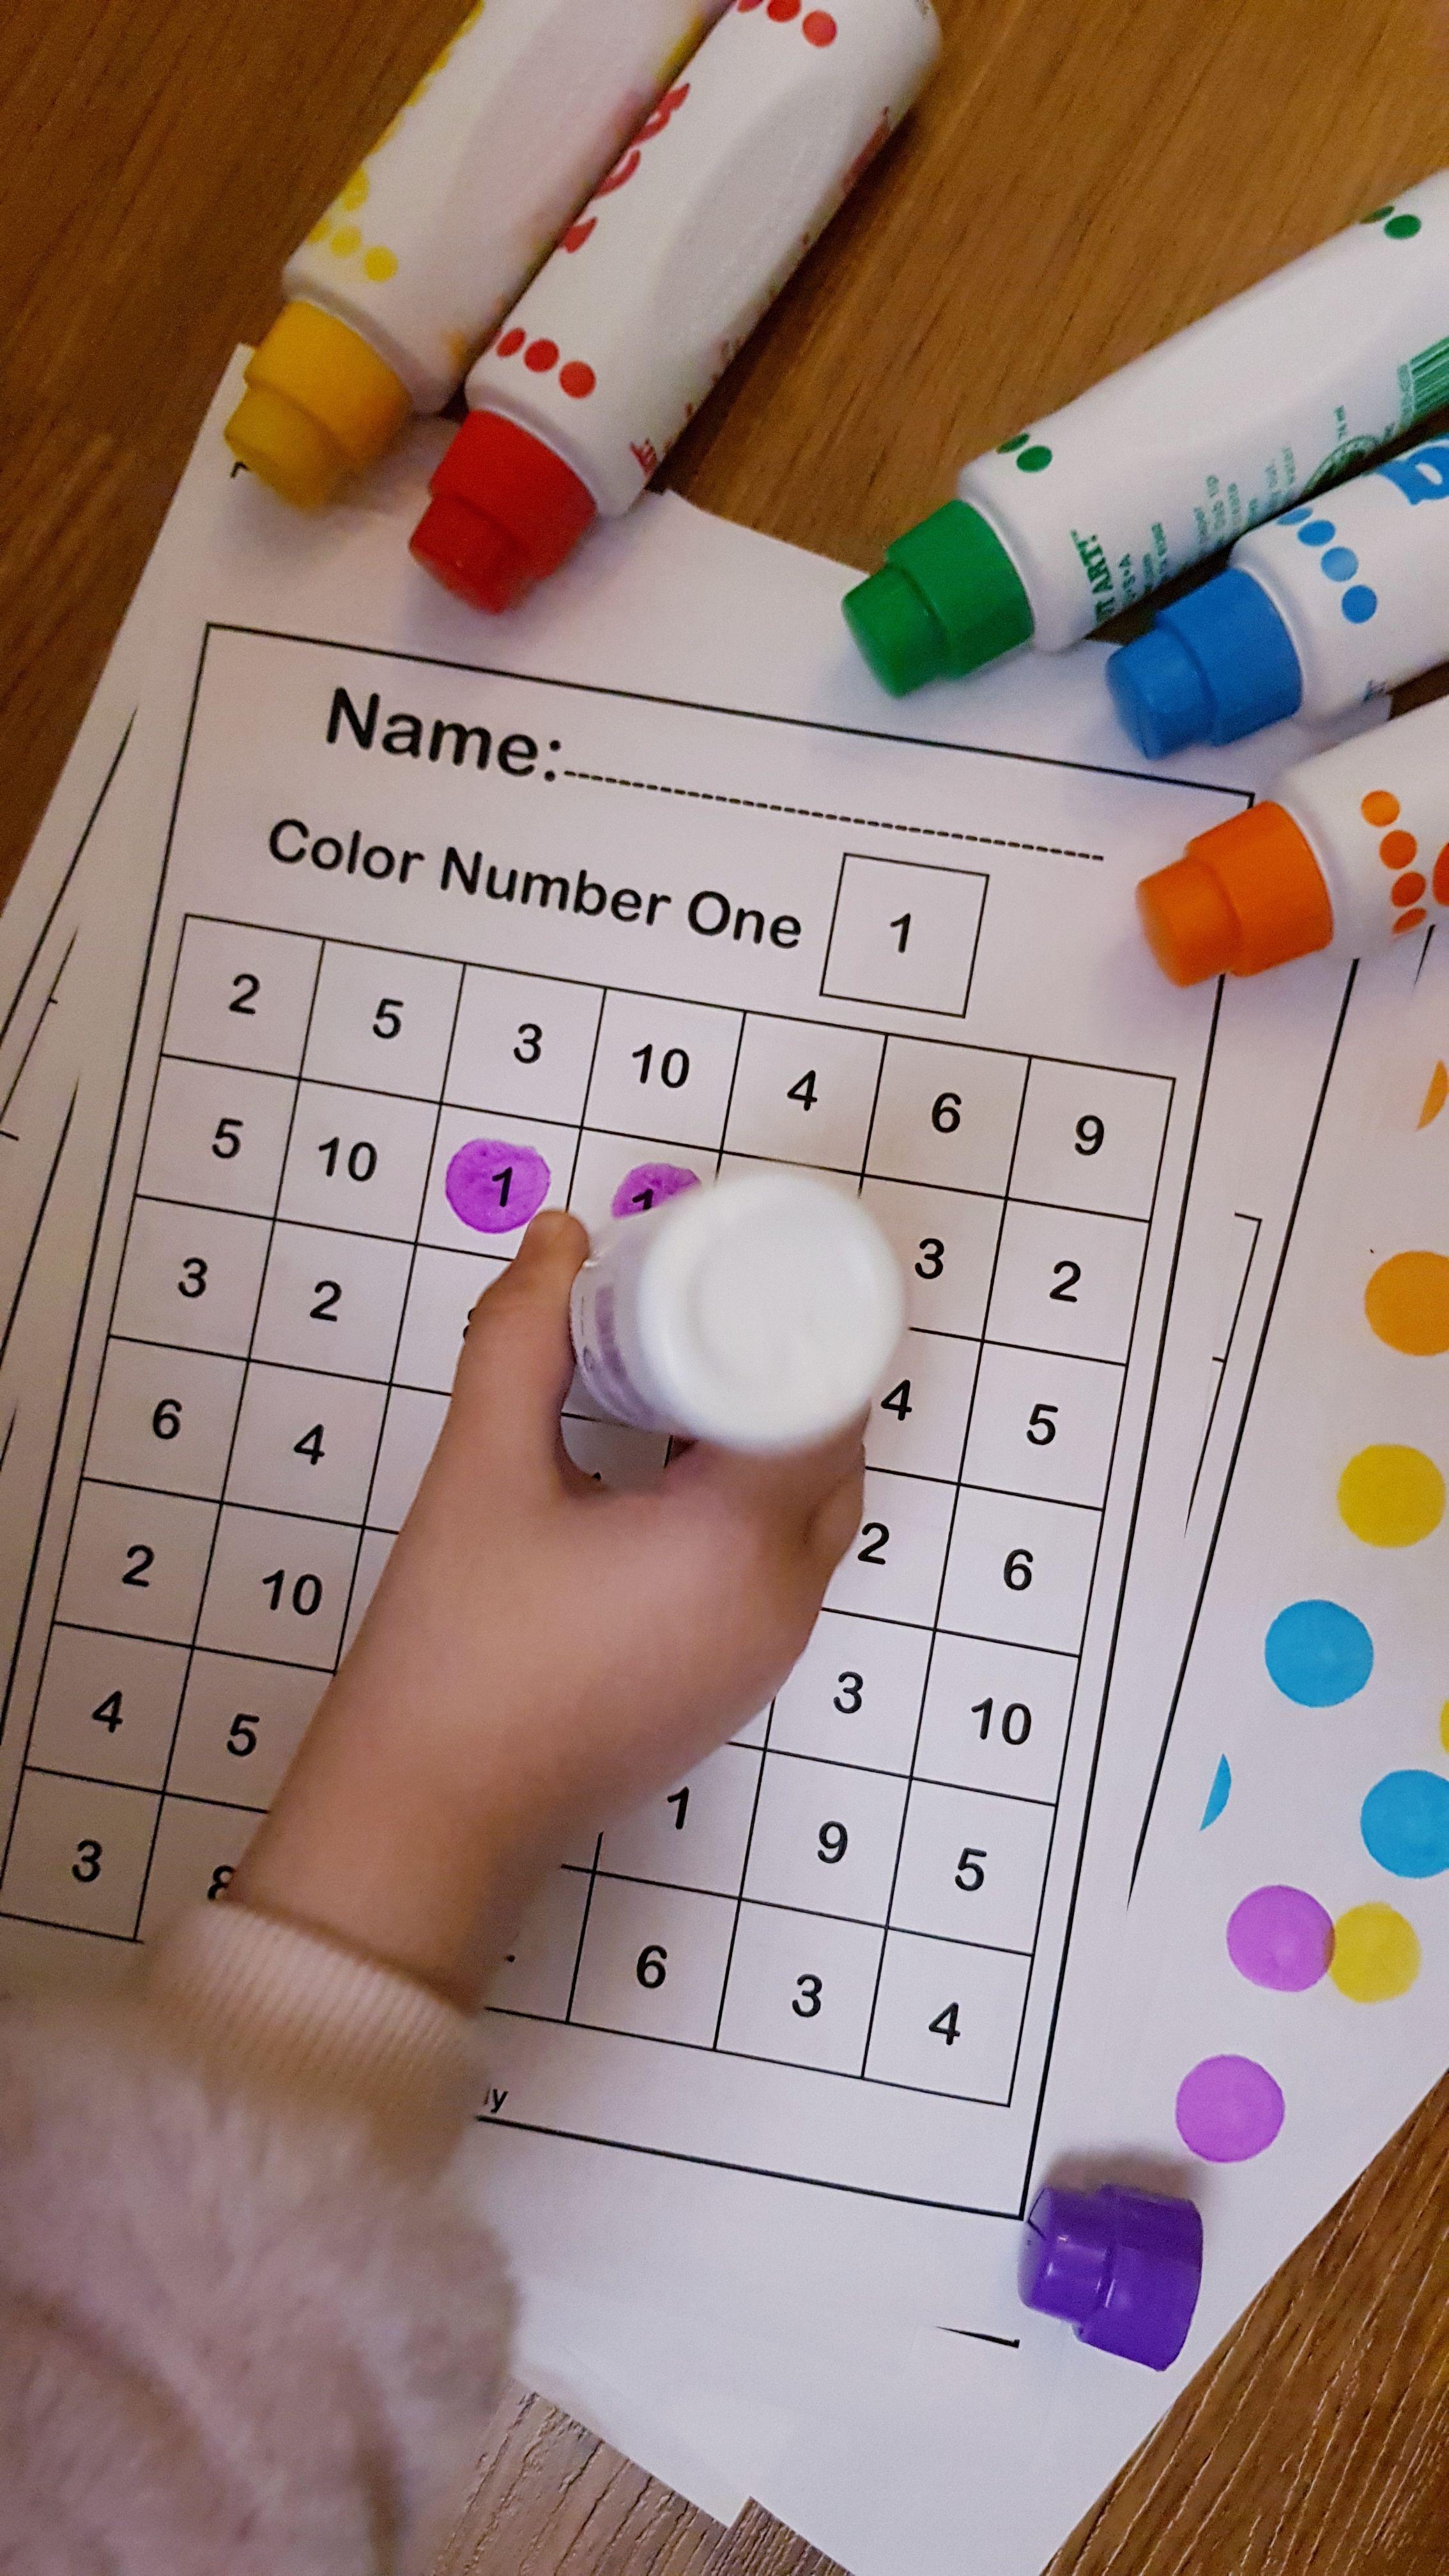 13 Preschool Number Set Worksheets 1 10 Coloring Style